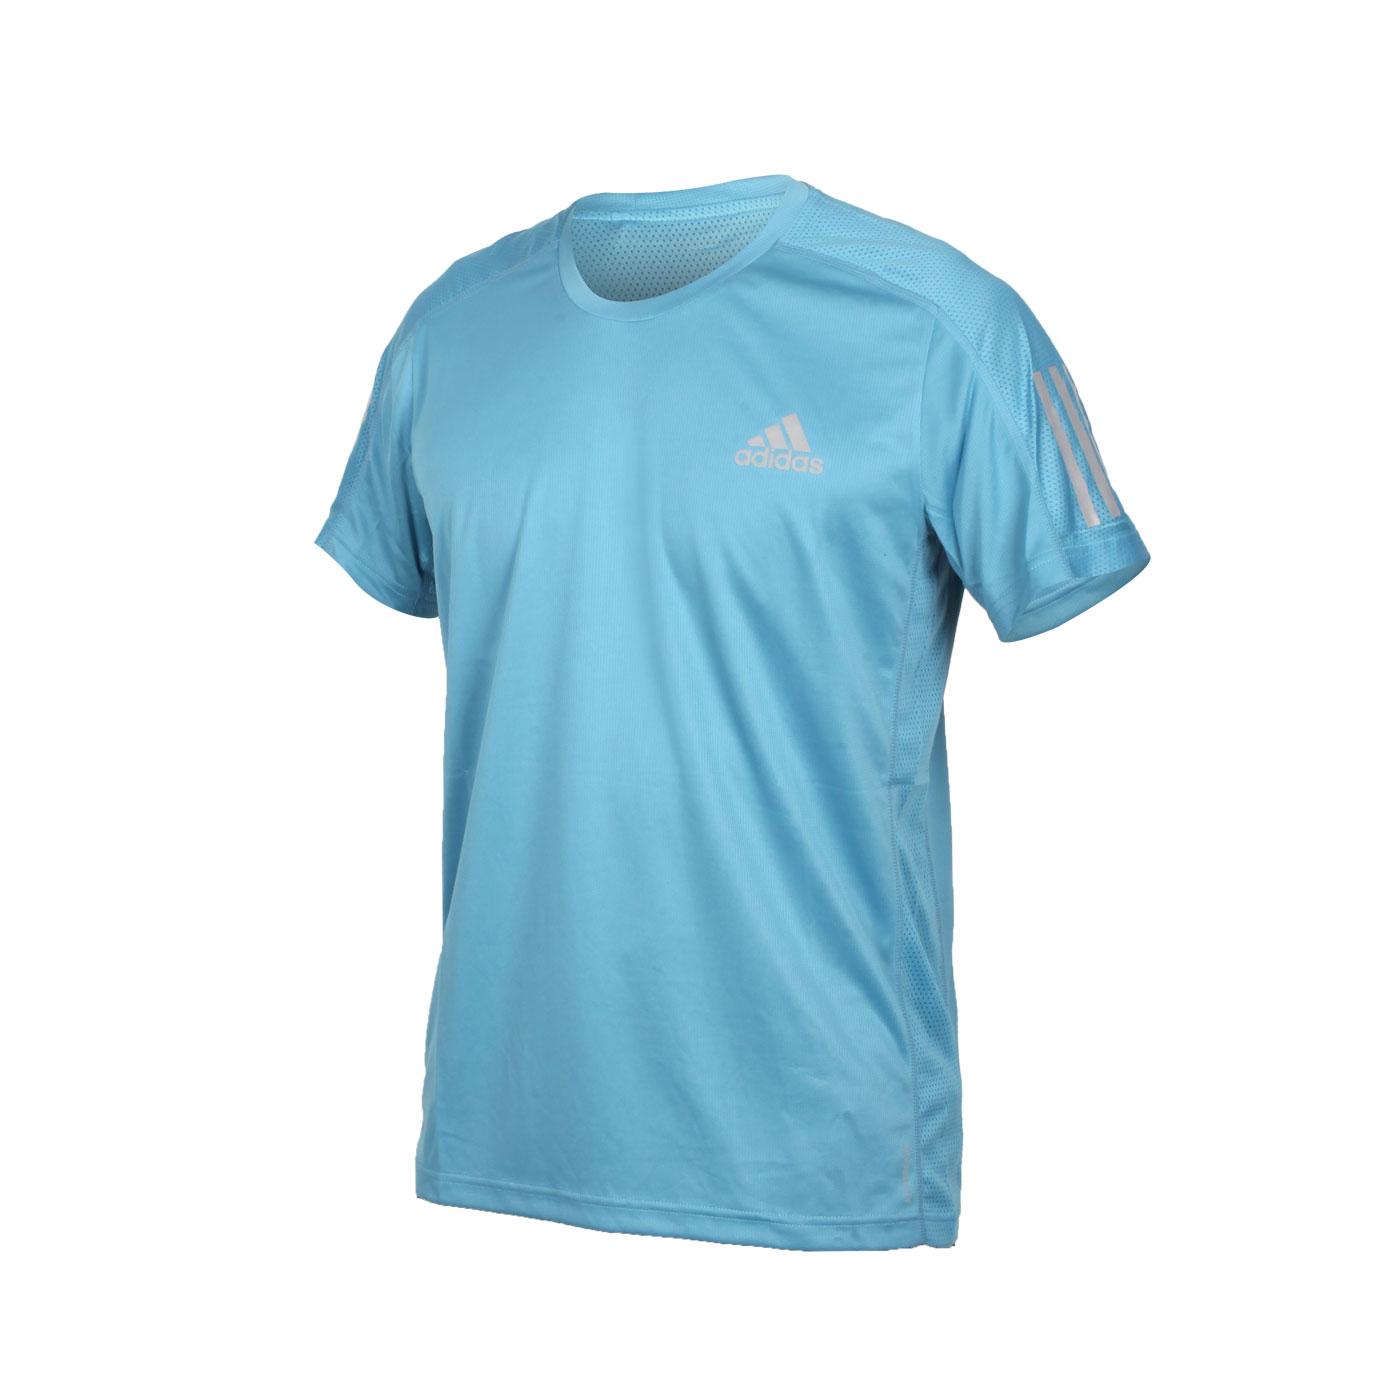 ADIDAS 男款短袖T恤 GJ9966 - 淺藍銀